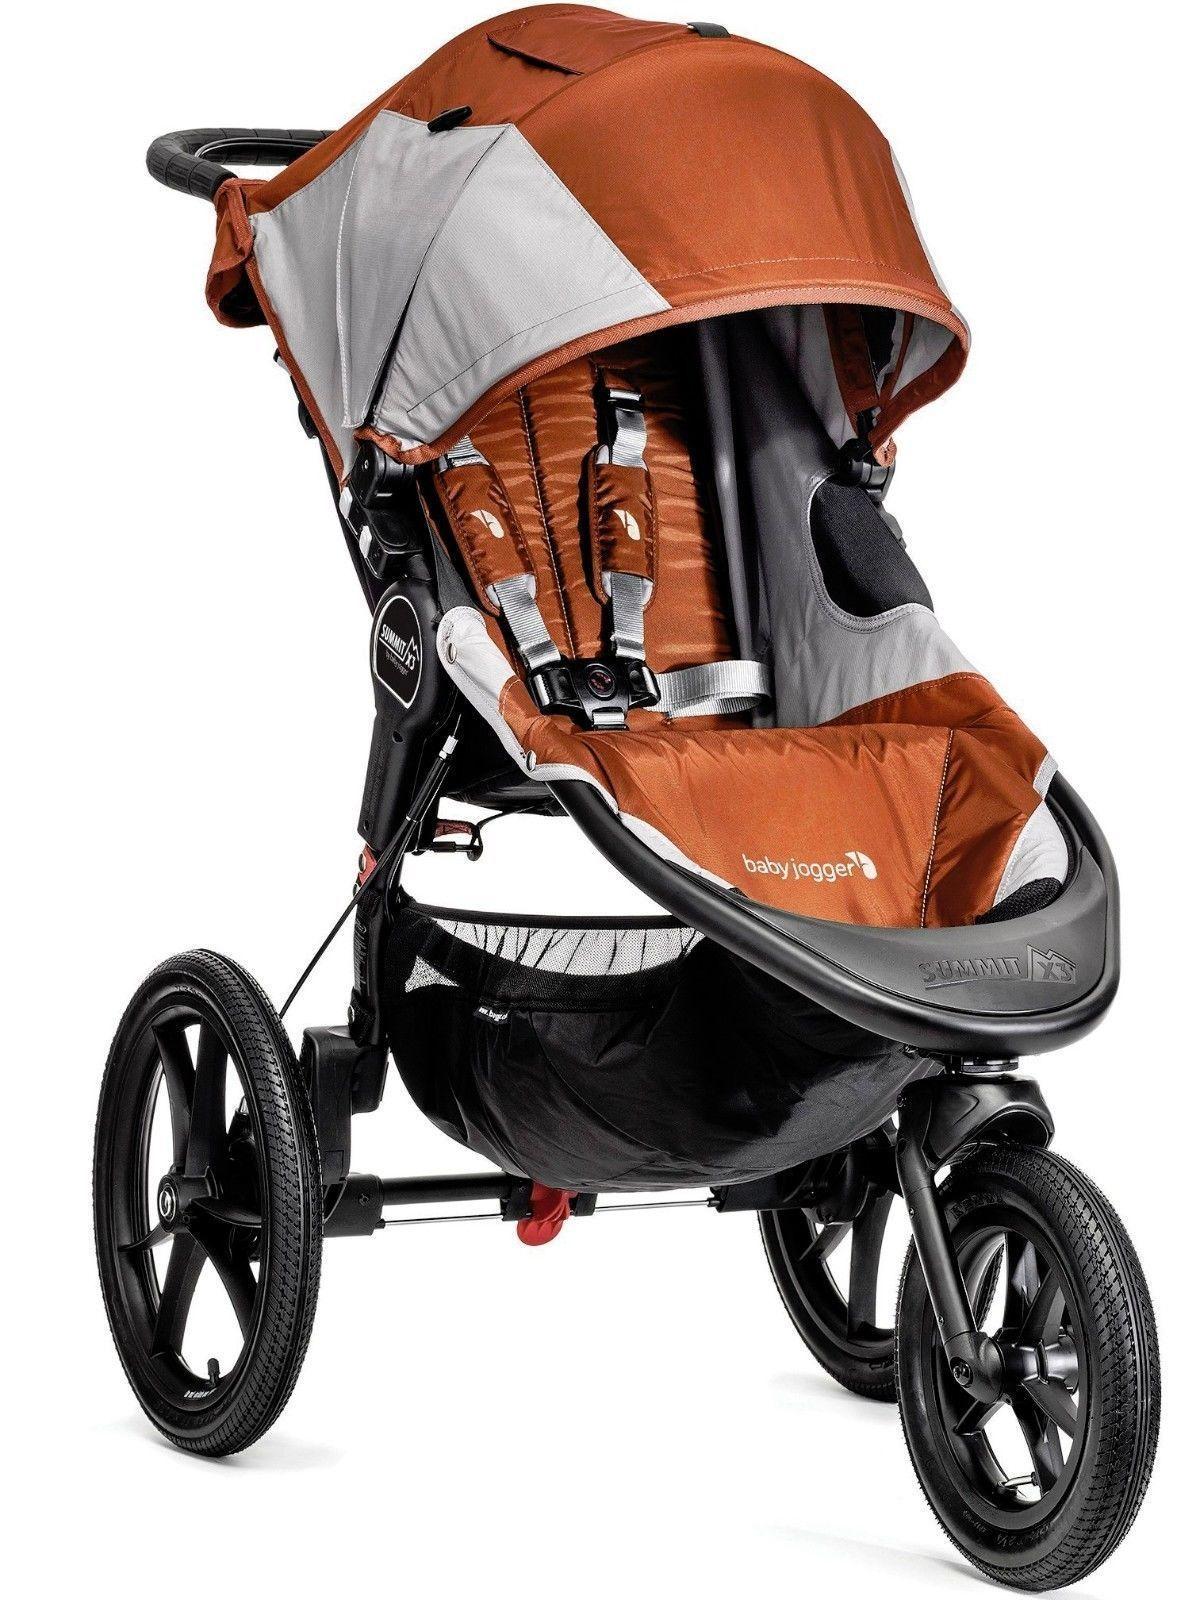 Baby Jogger Summit X3 Jogging troller Orange / Gray NEW